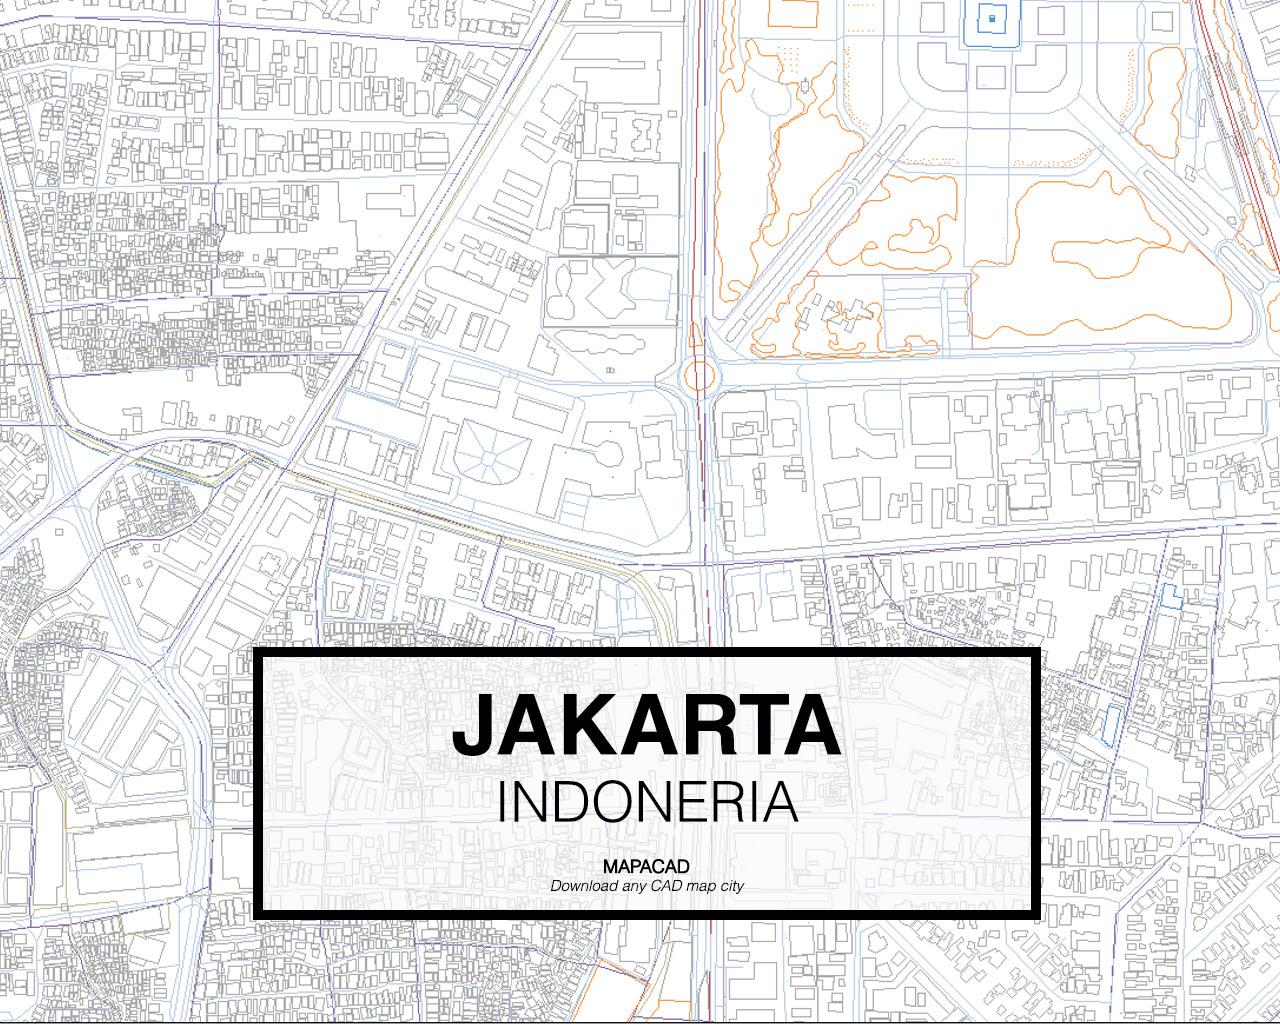 Jakarta-Indonesia-V02-03-Mapacad-download-map-cad-dwg-dxf-autocad-free-2d-3d